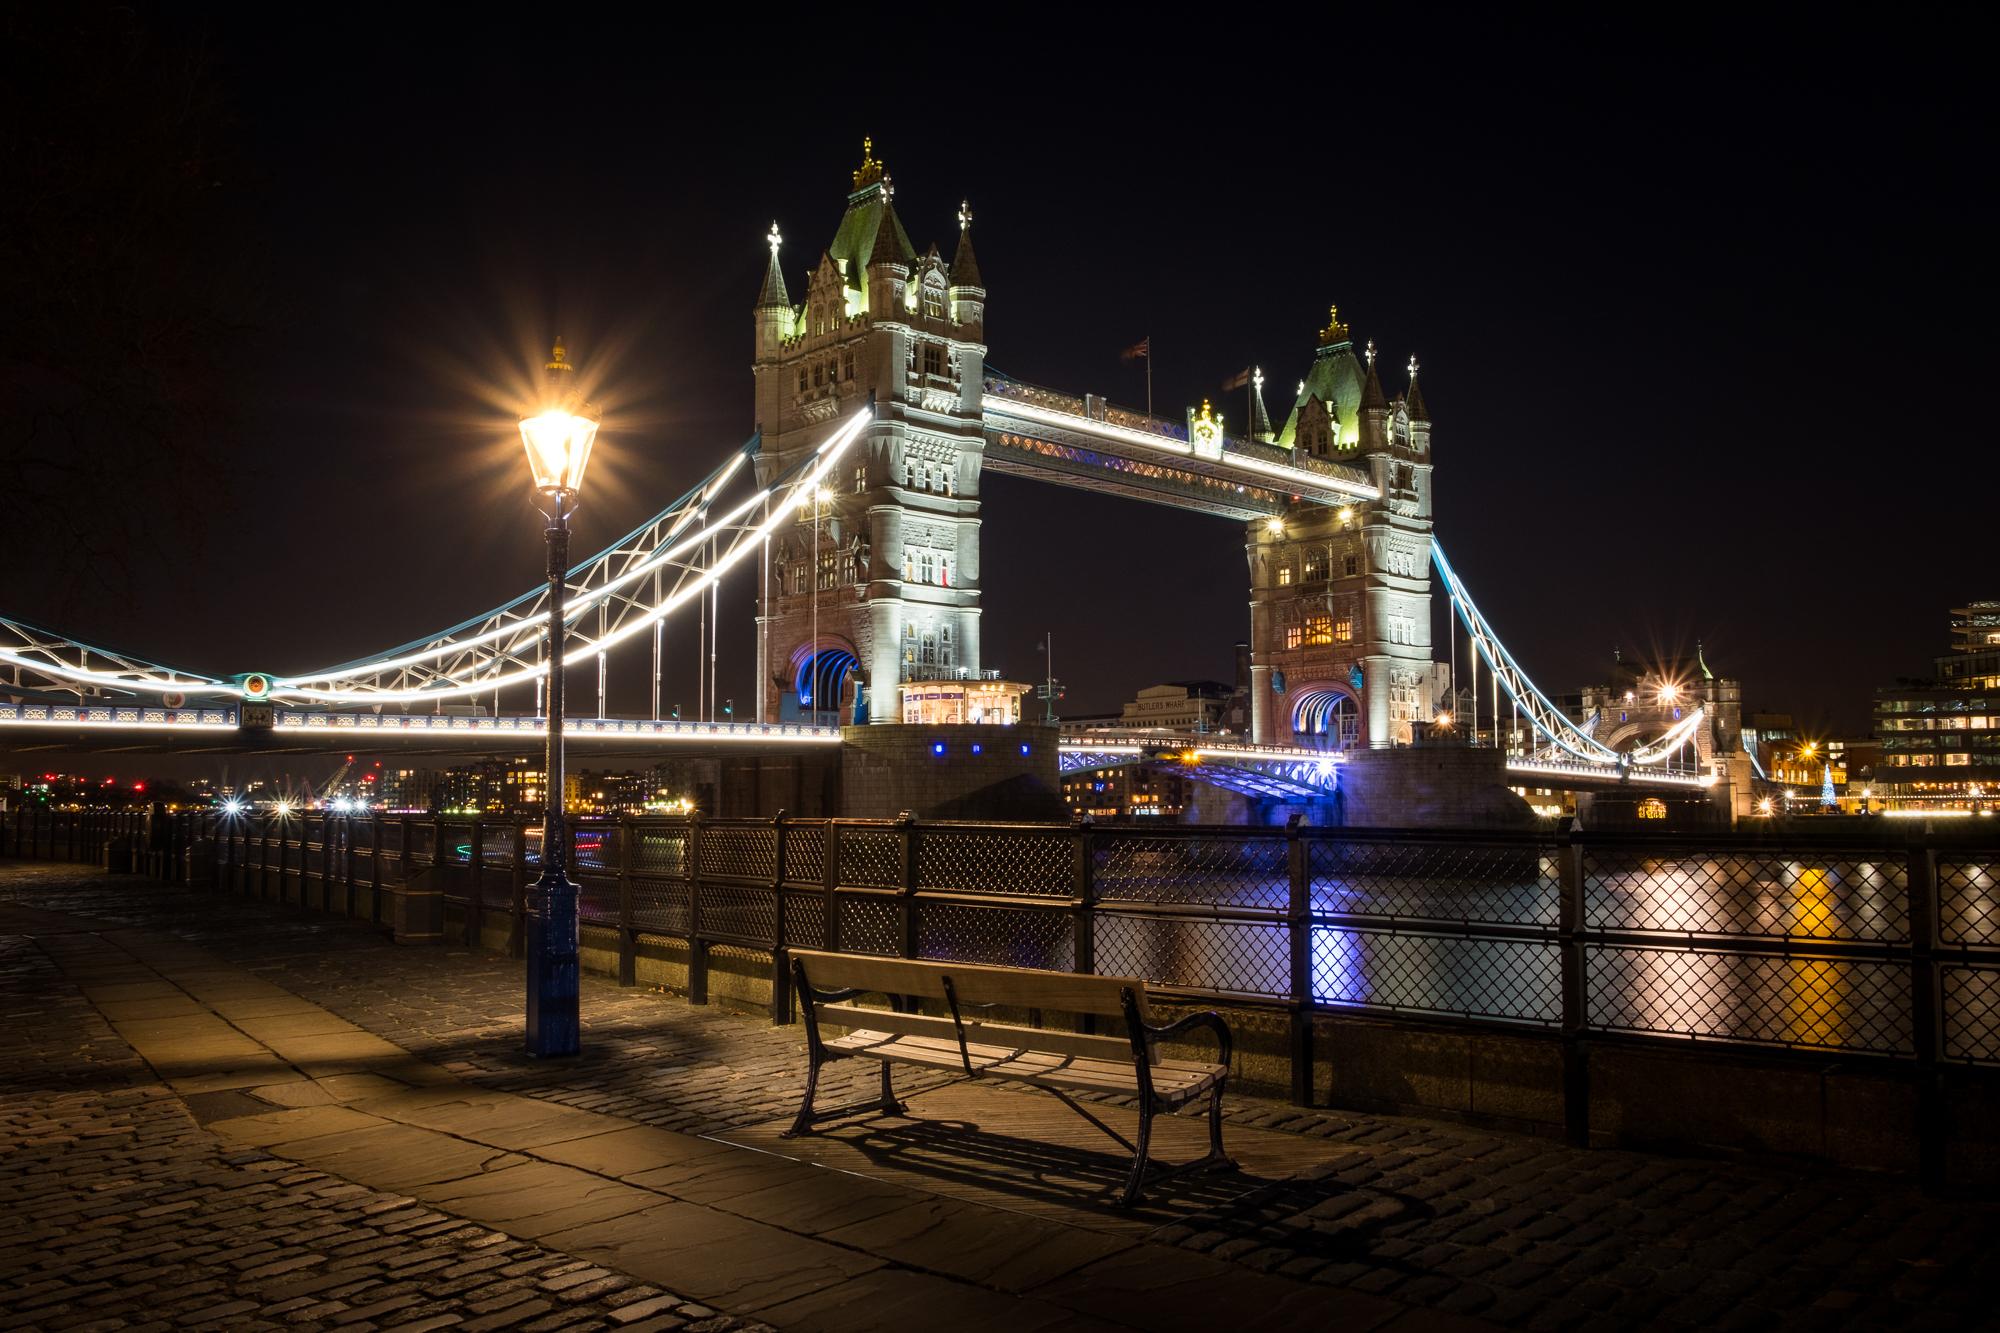 171214 - London - Night - Tower Bridge 001.jpg